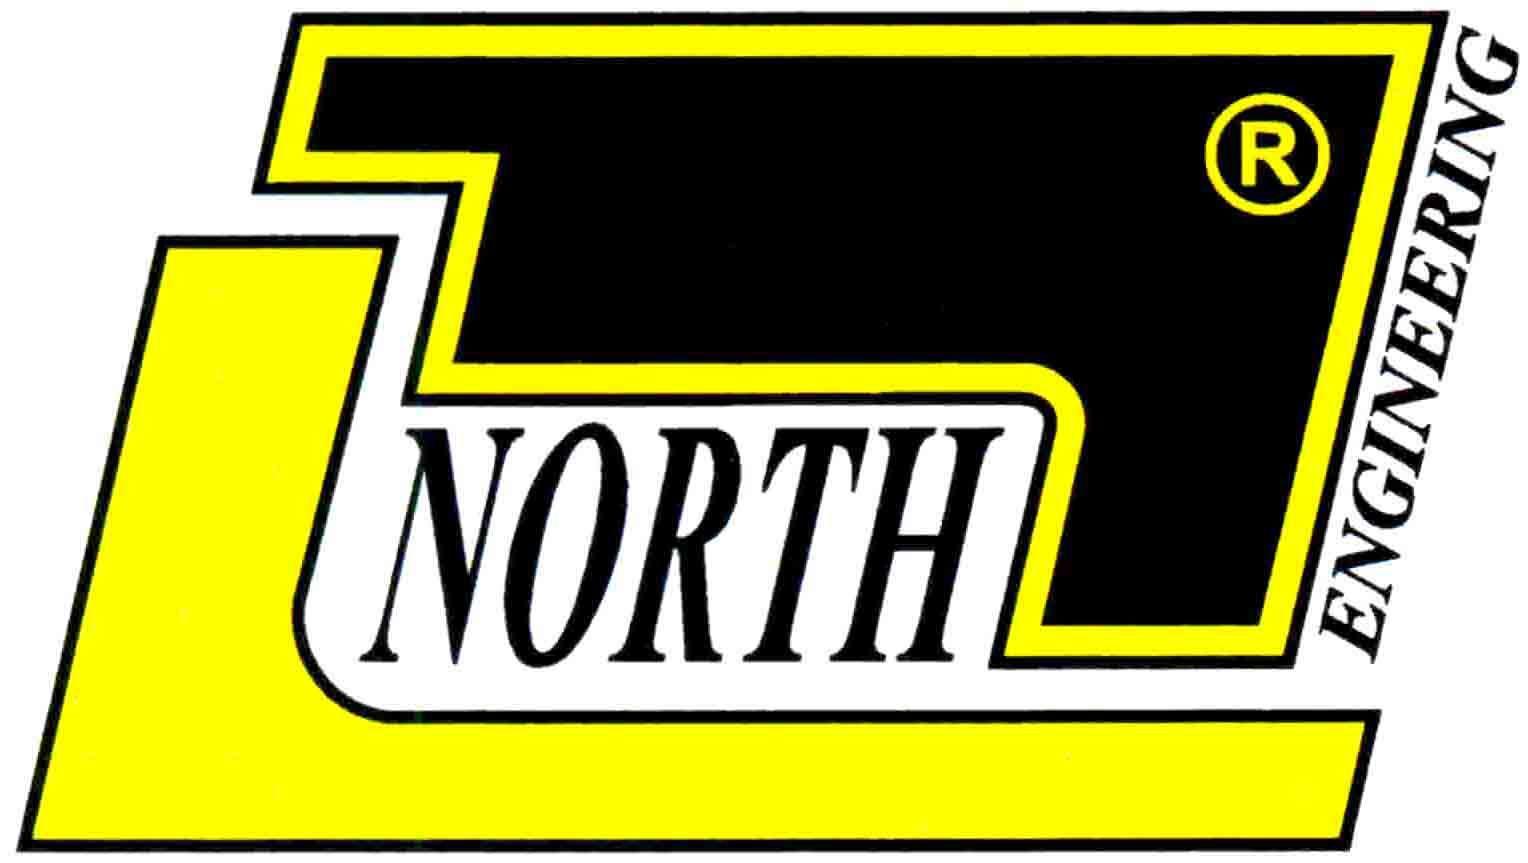 North Engineering d.o.o.